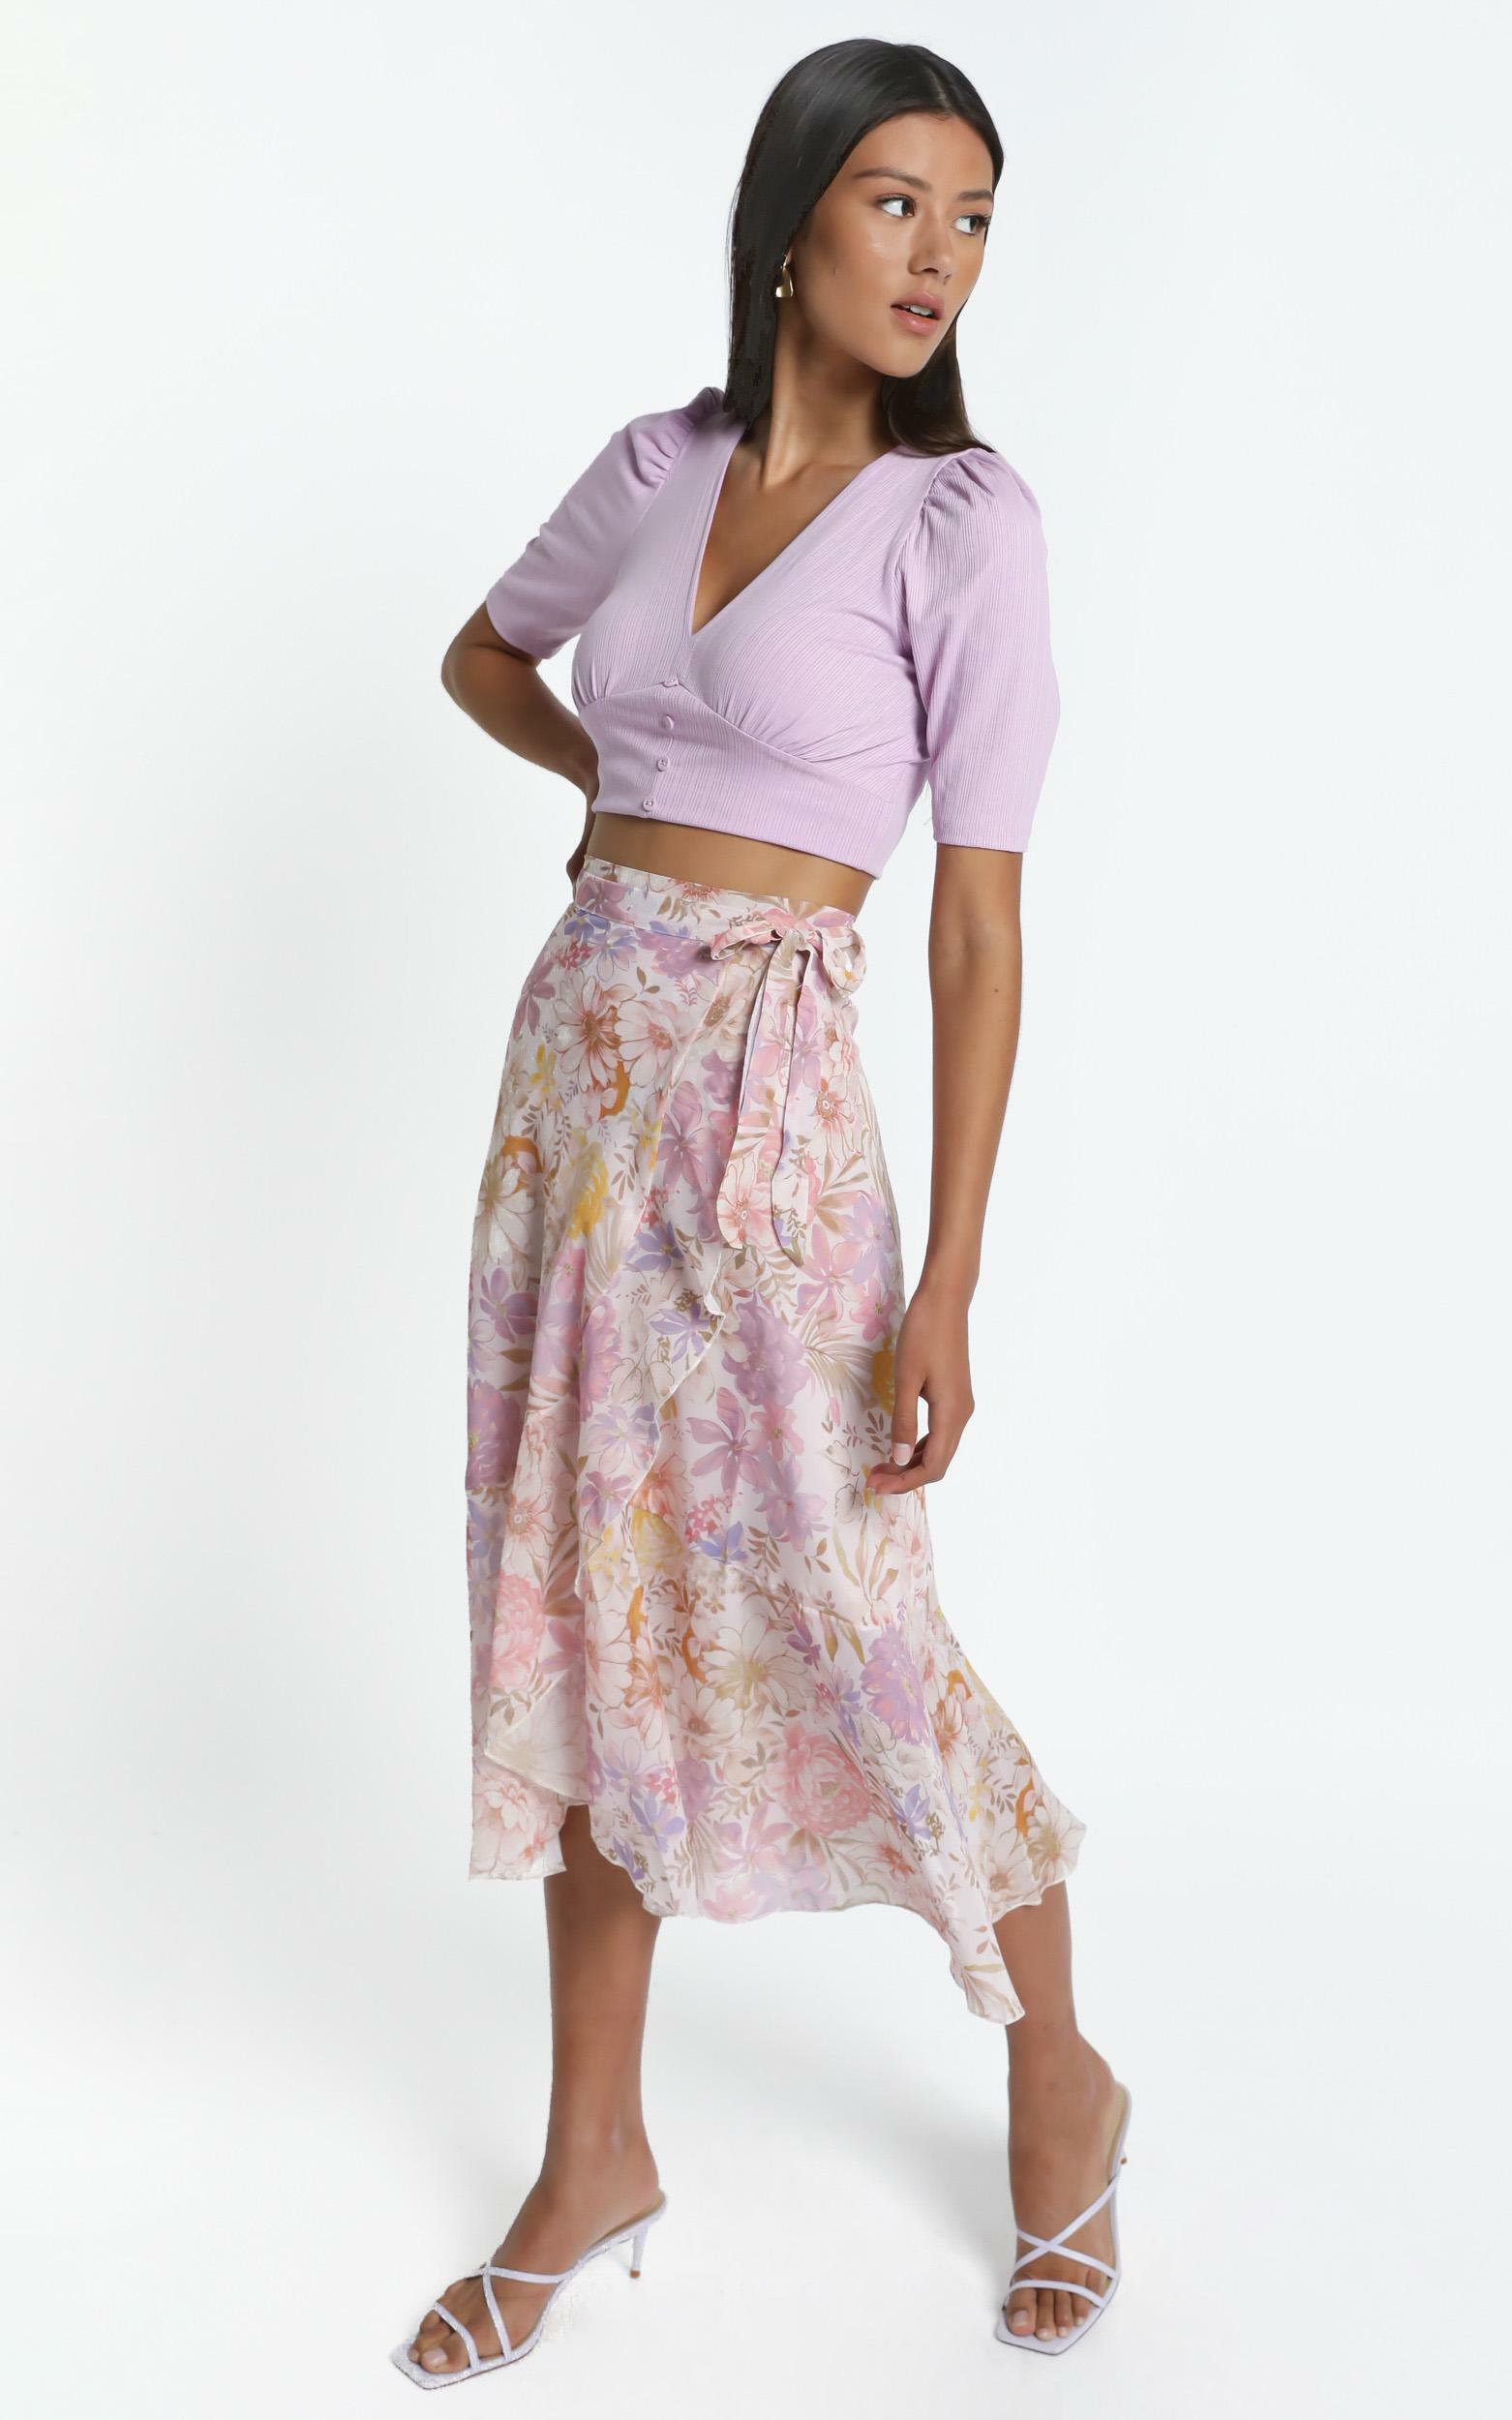 Neala Skirt in Vintage Floral - 06, CRE1, hi-res image number null